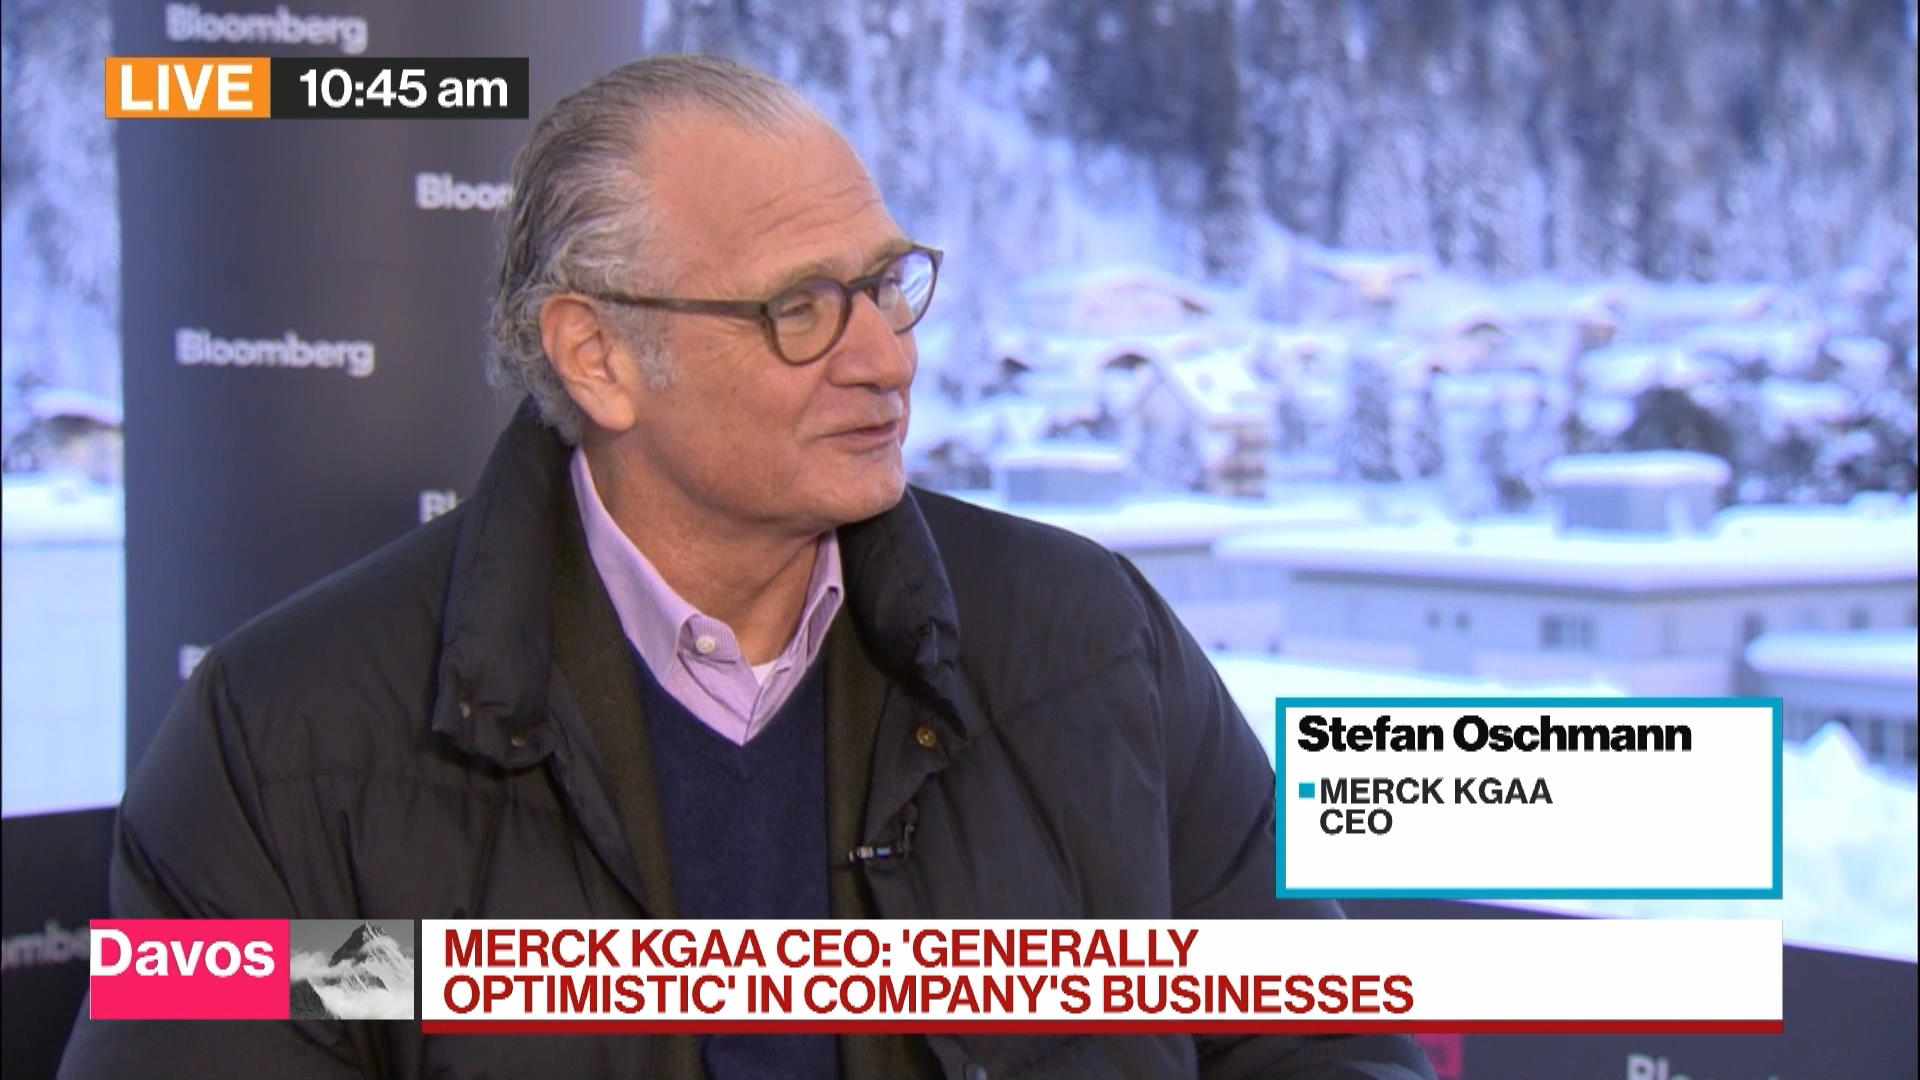 MRK:Xetra Stock Quote - Merck KGaA - Bloomberg Markets